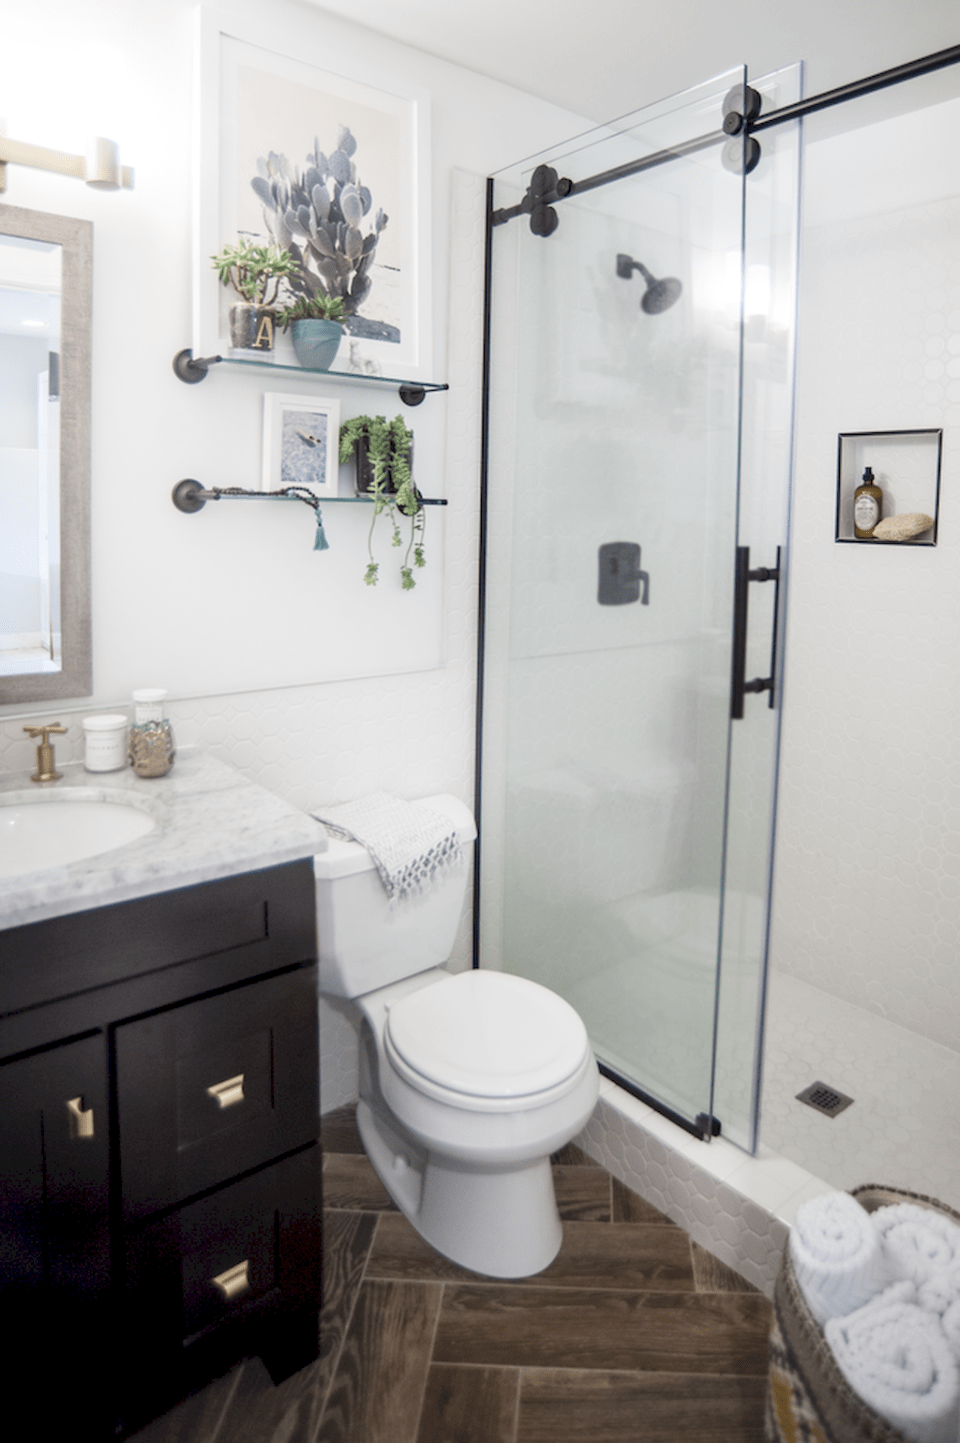 85 beautiful small bathroom decor ideas on a budget